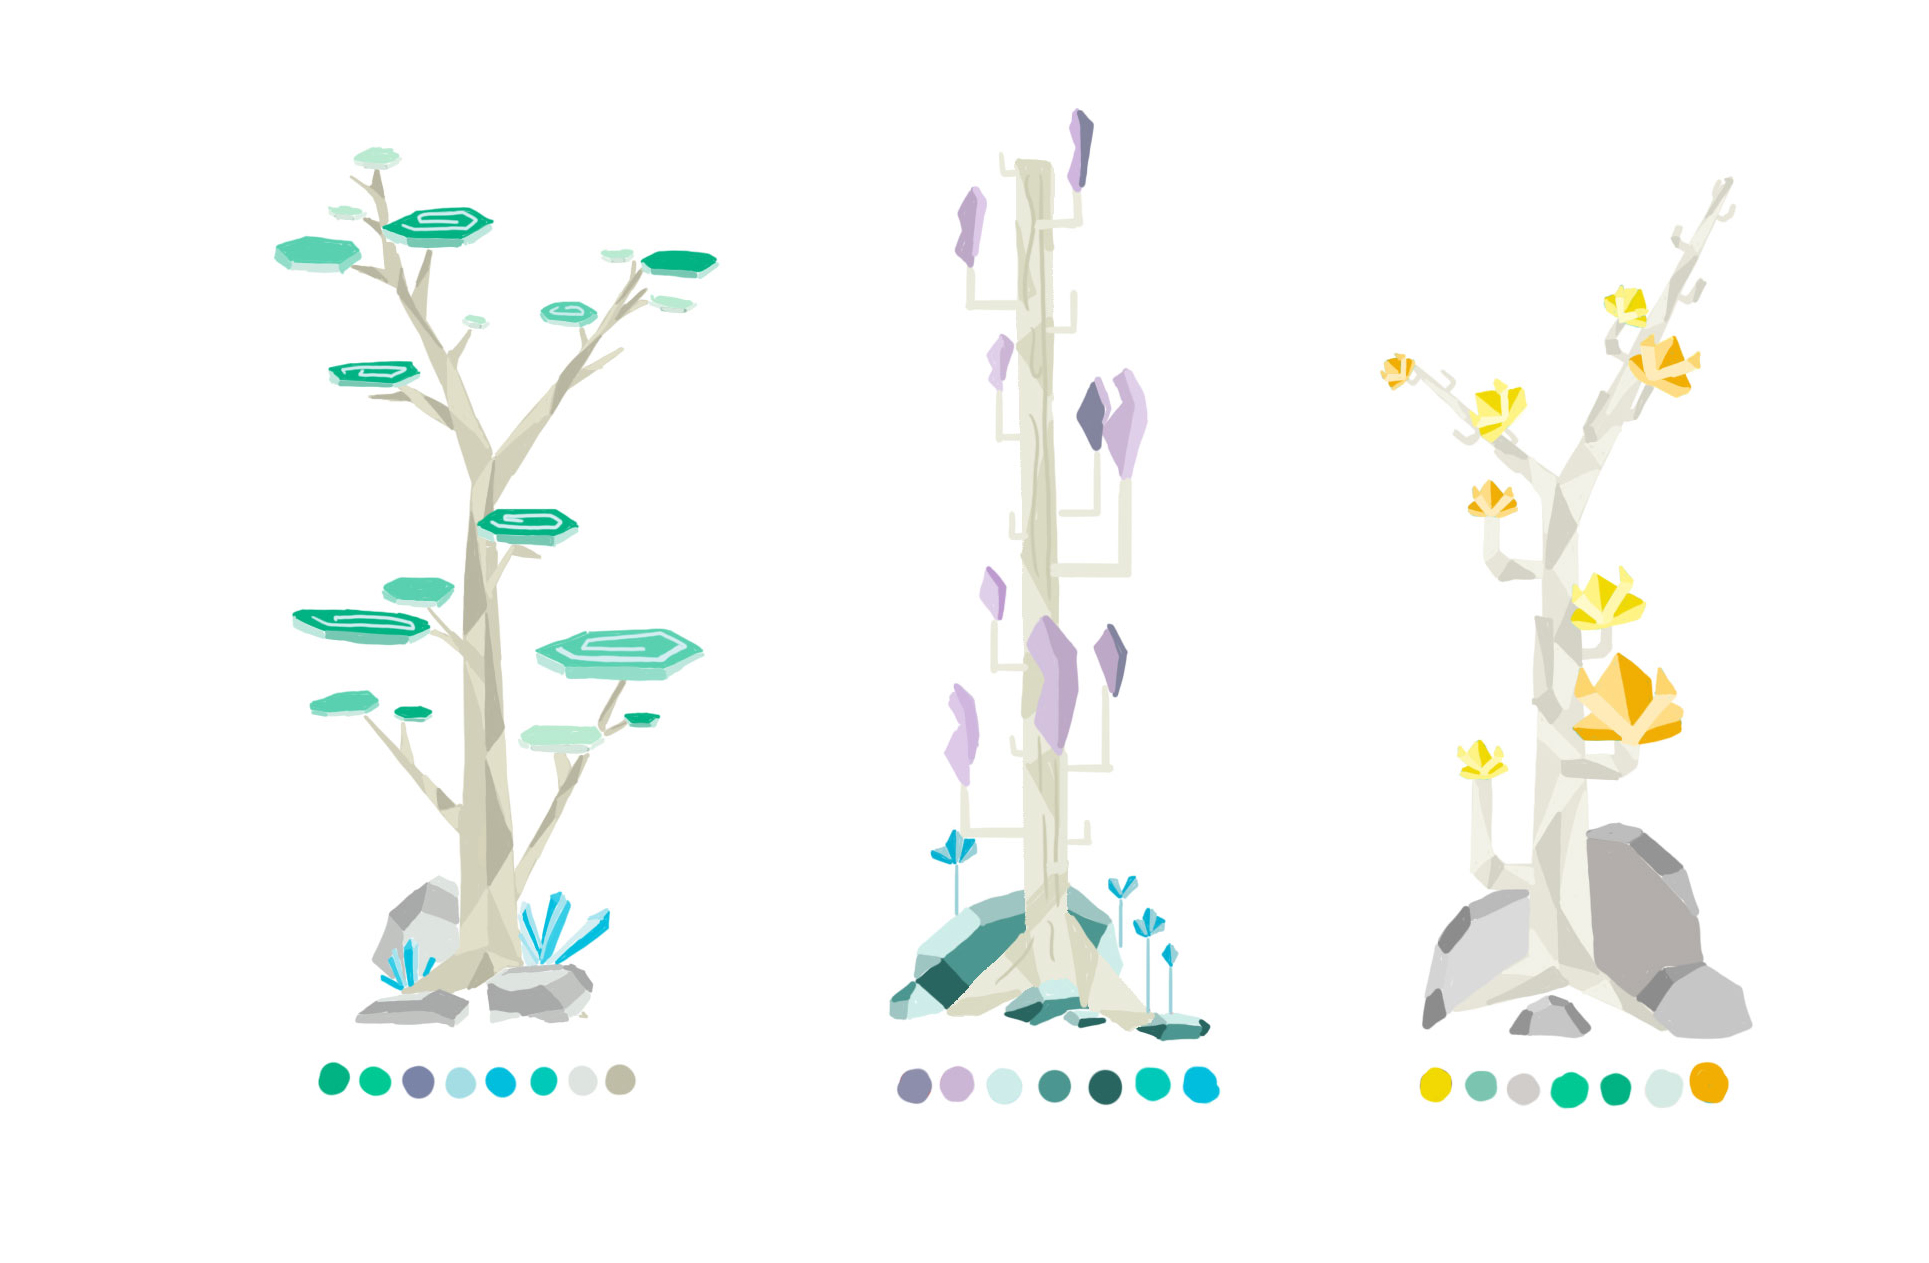 Strata-Tree-Color-WE-v002.jpg